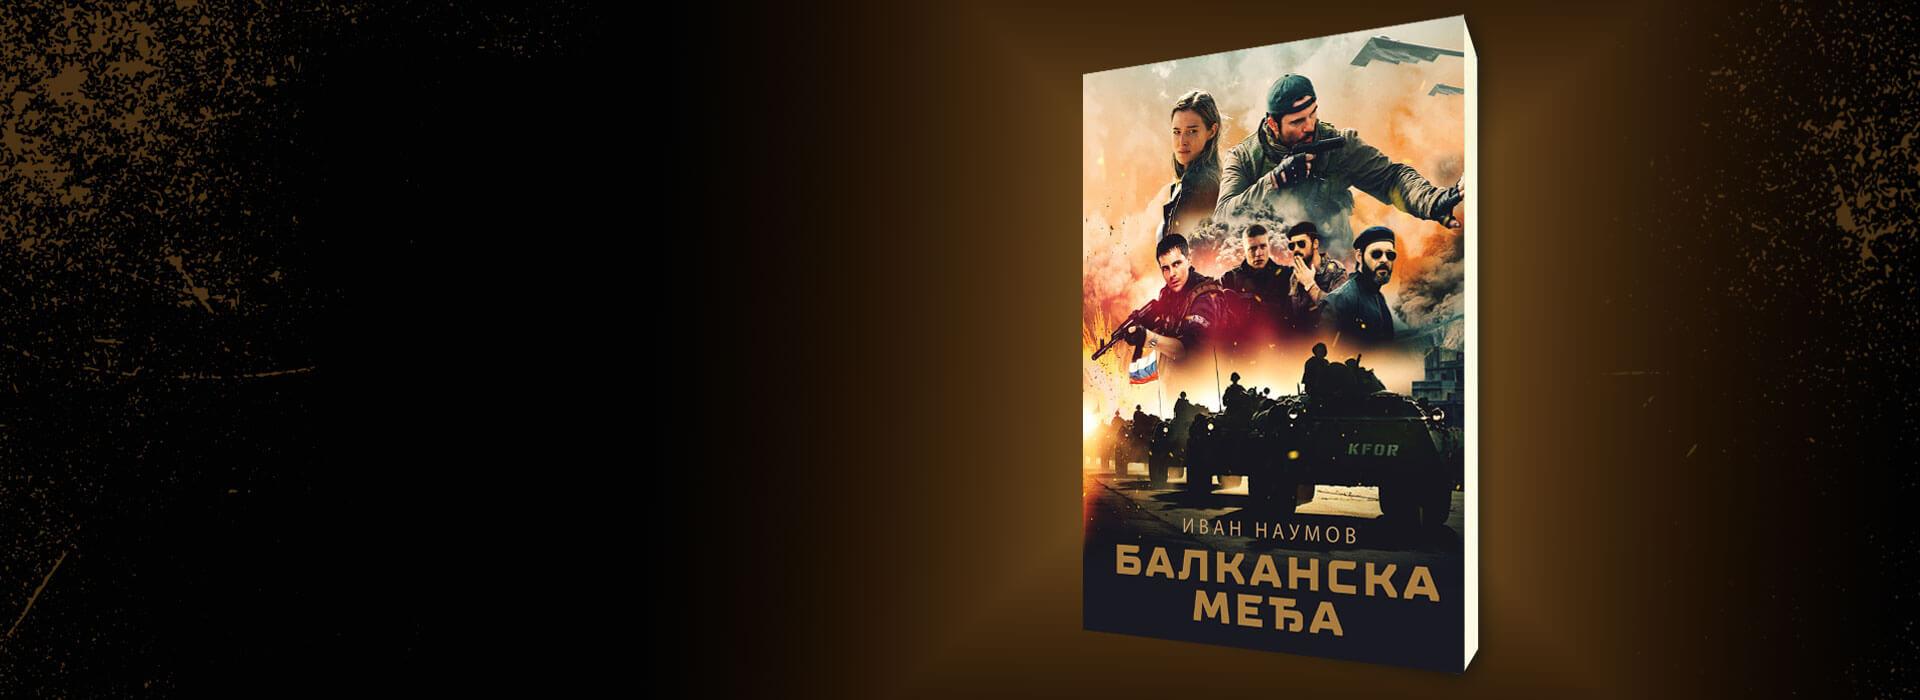 Balkanska međa knjiga